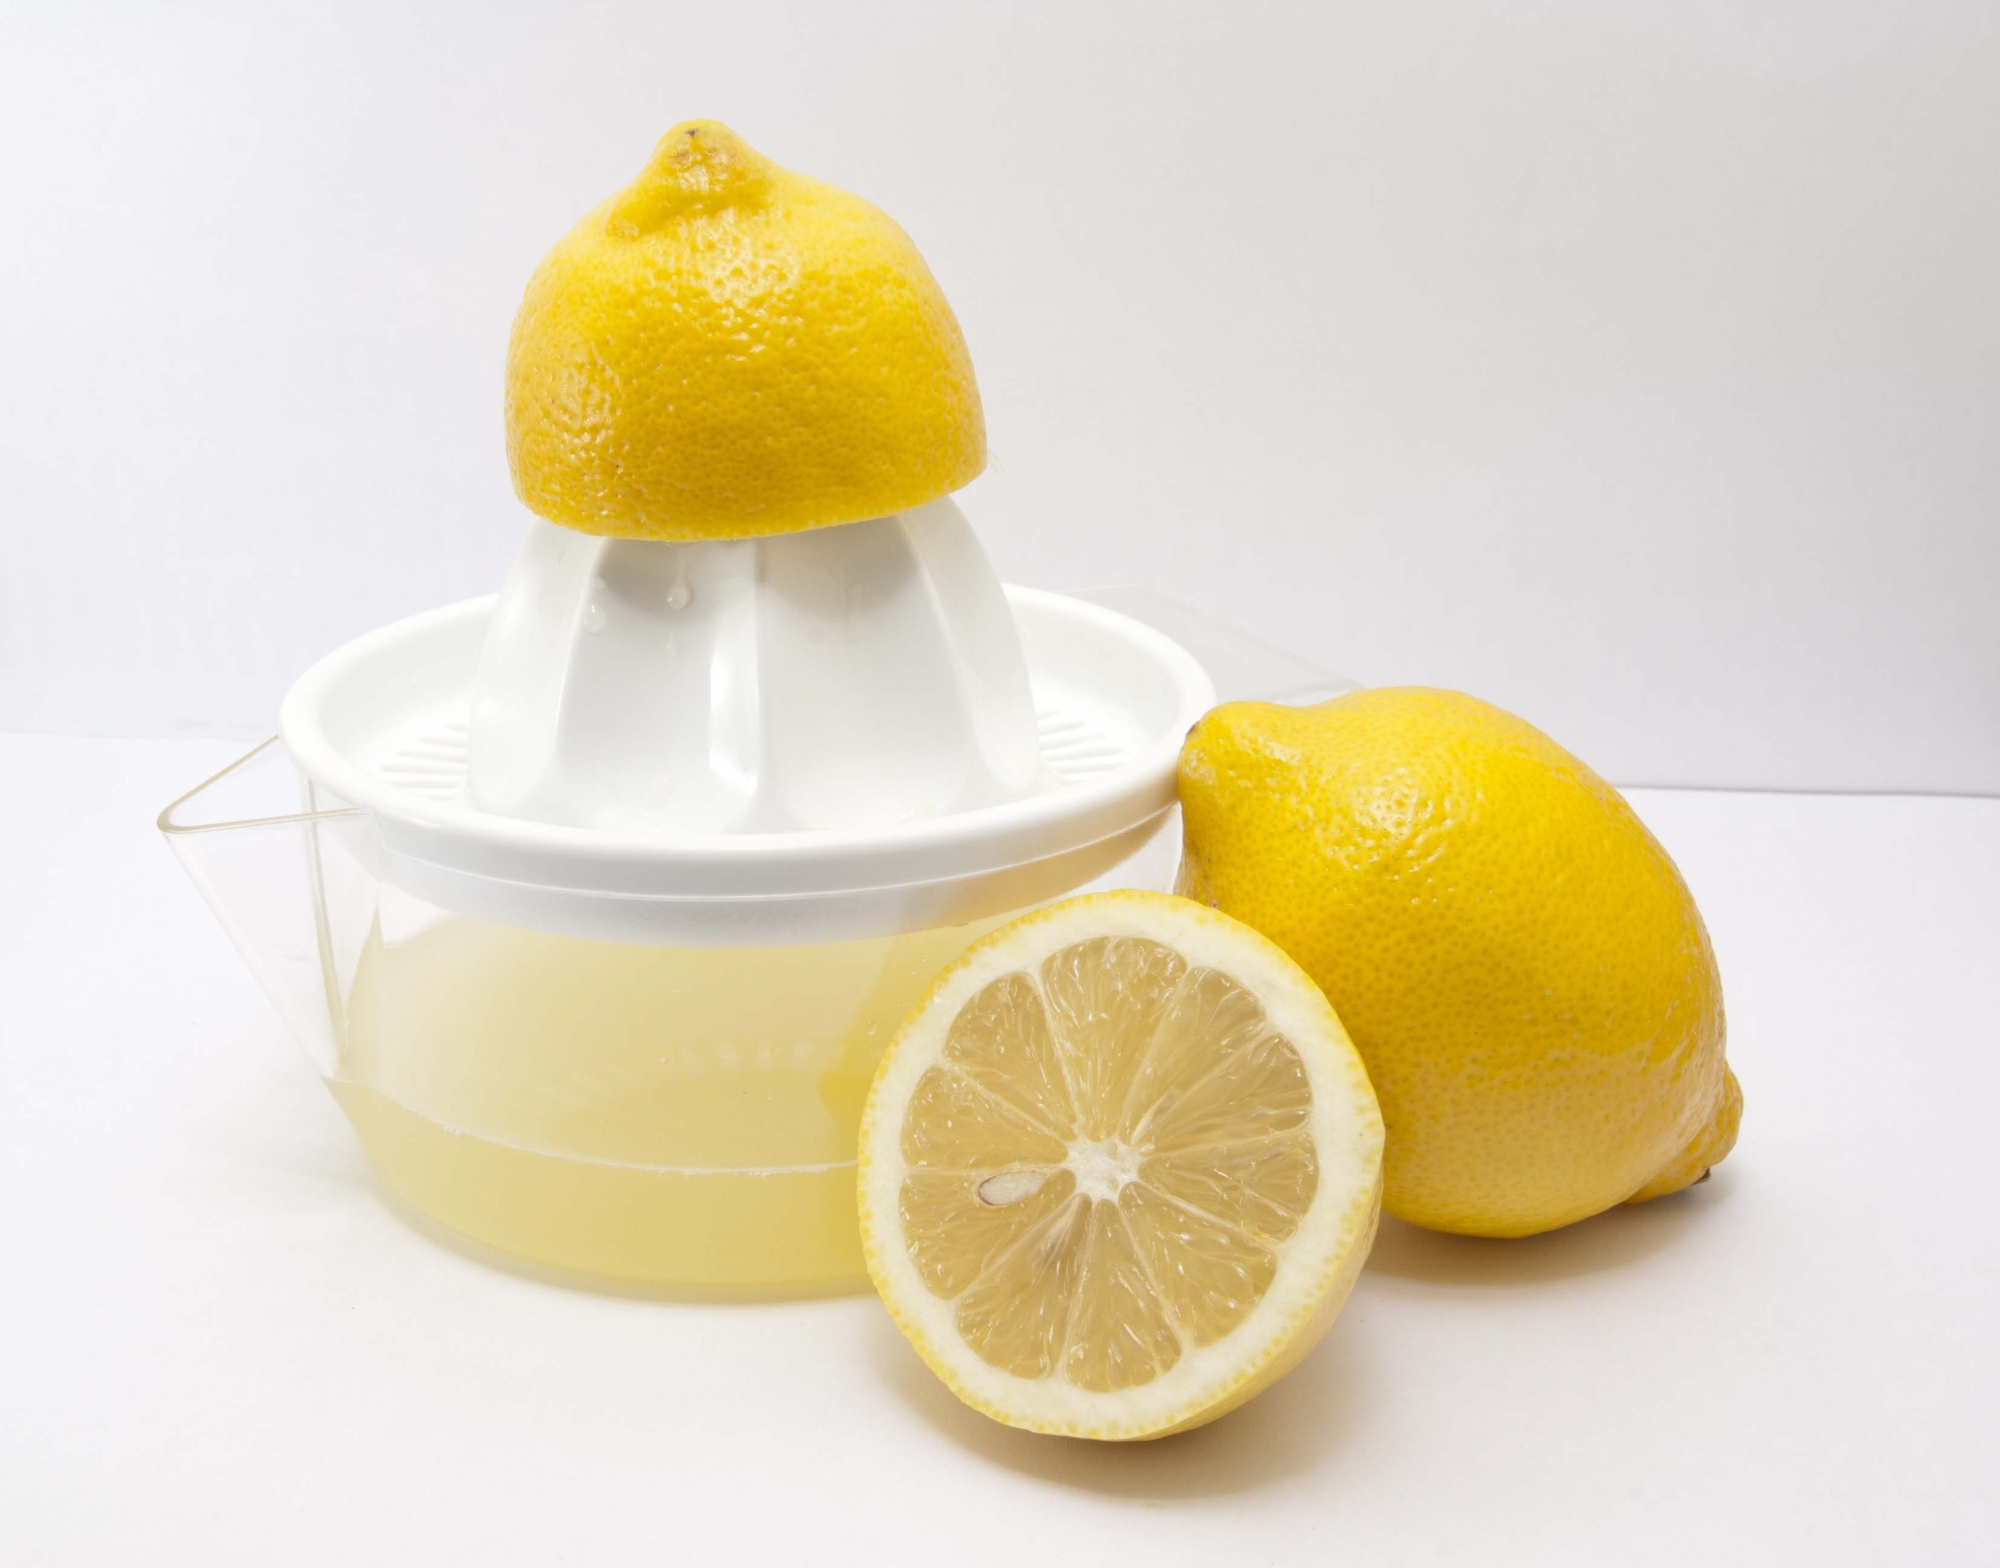 picaduras-de-chinches-remedios-caseros-zumo-de-limon